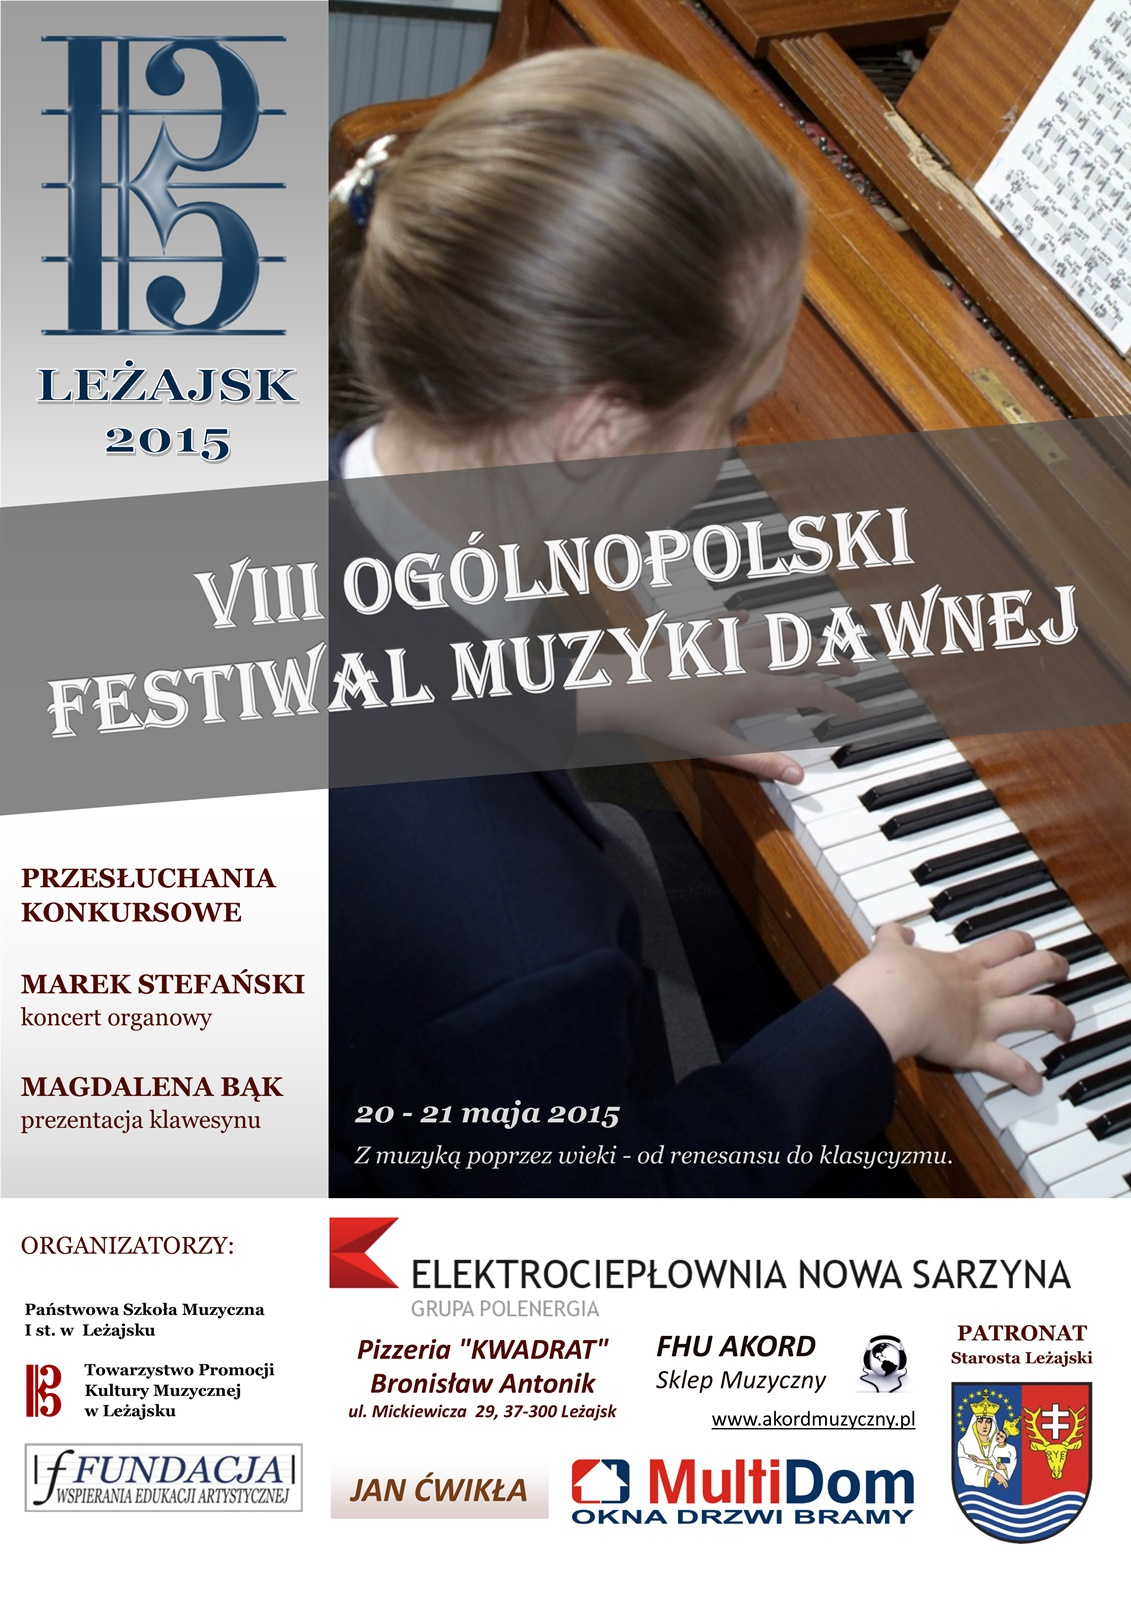 VIII Ogólnopolski Festiwal Muzyki Dawnej - plakat